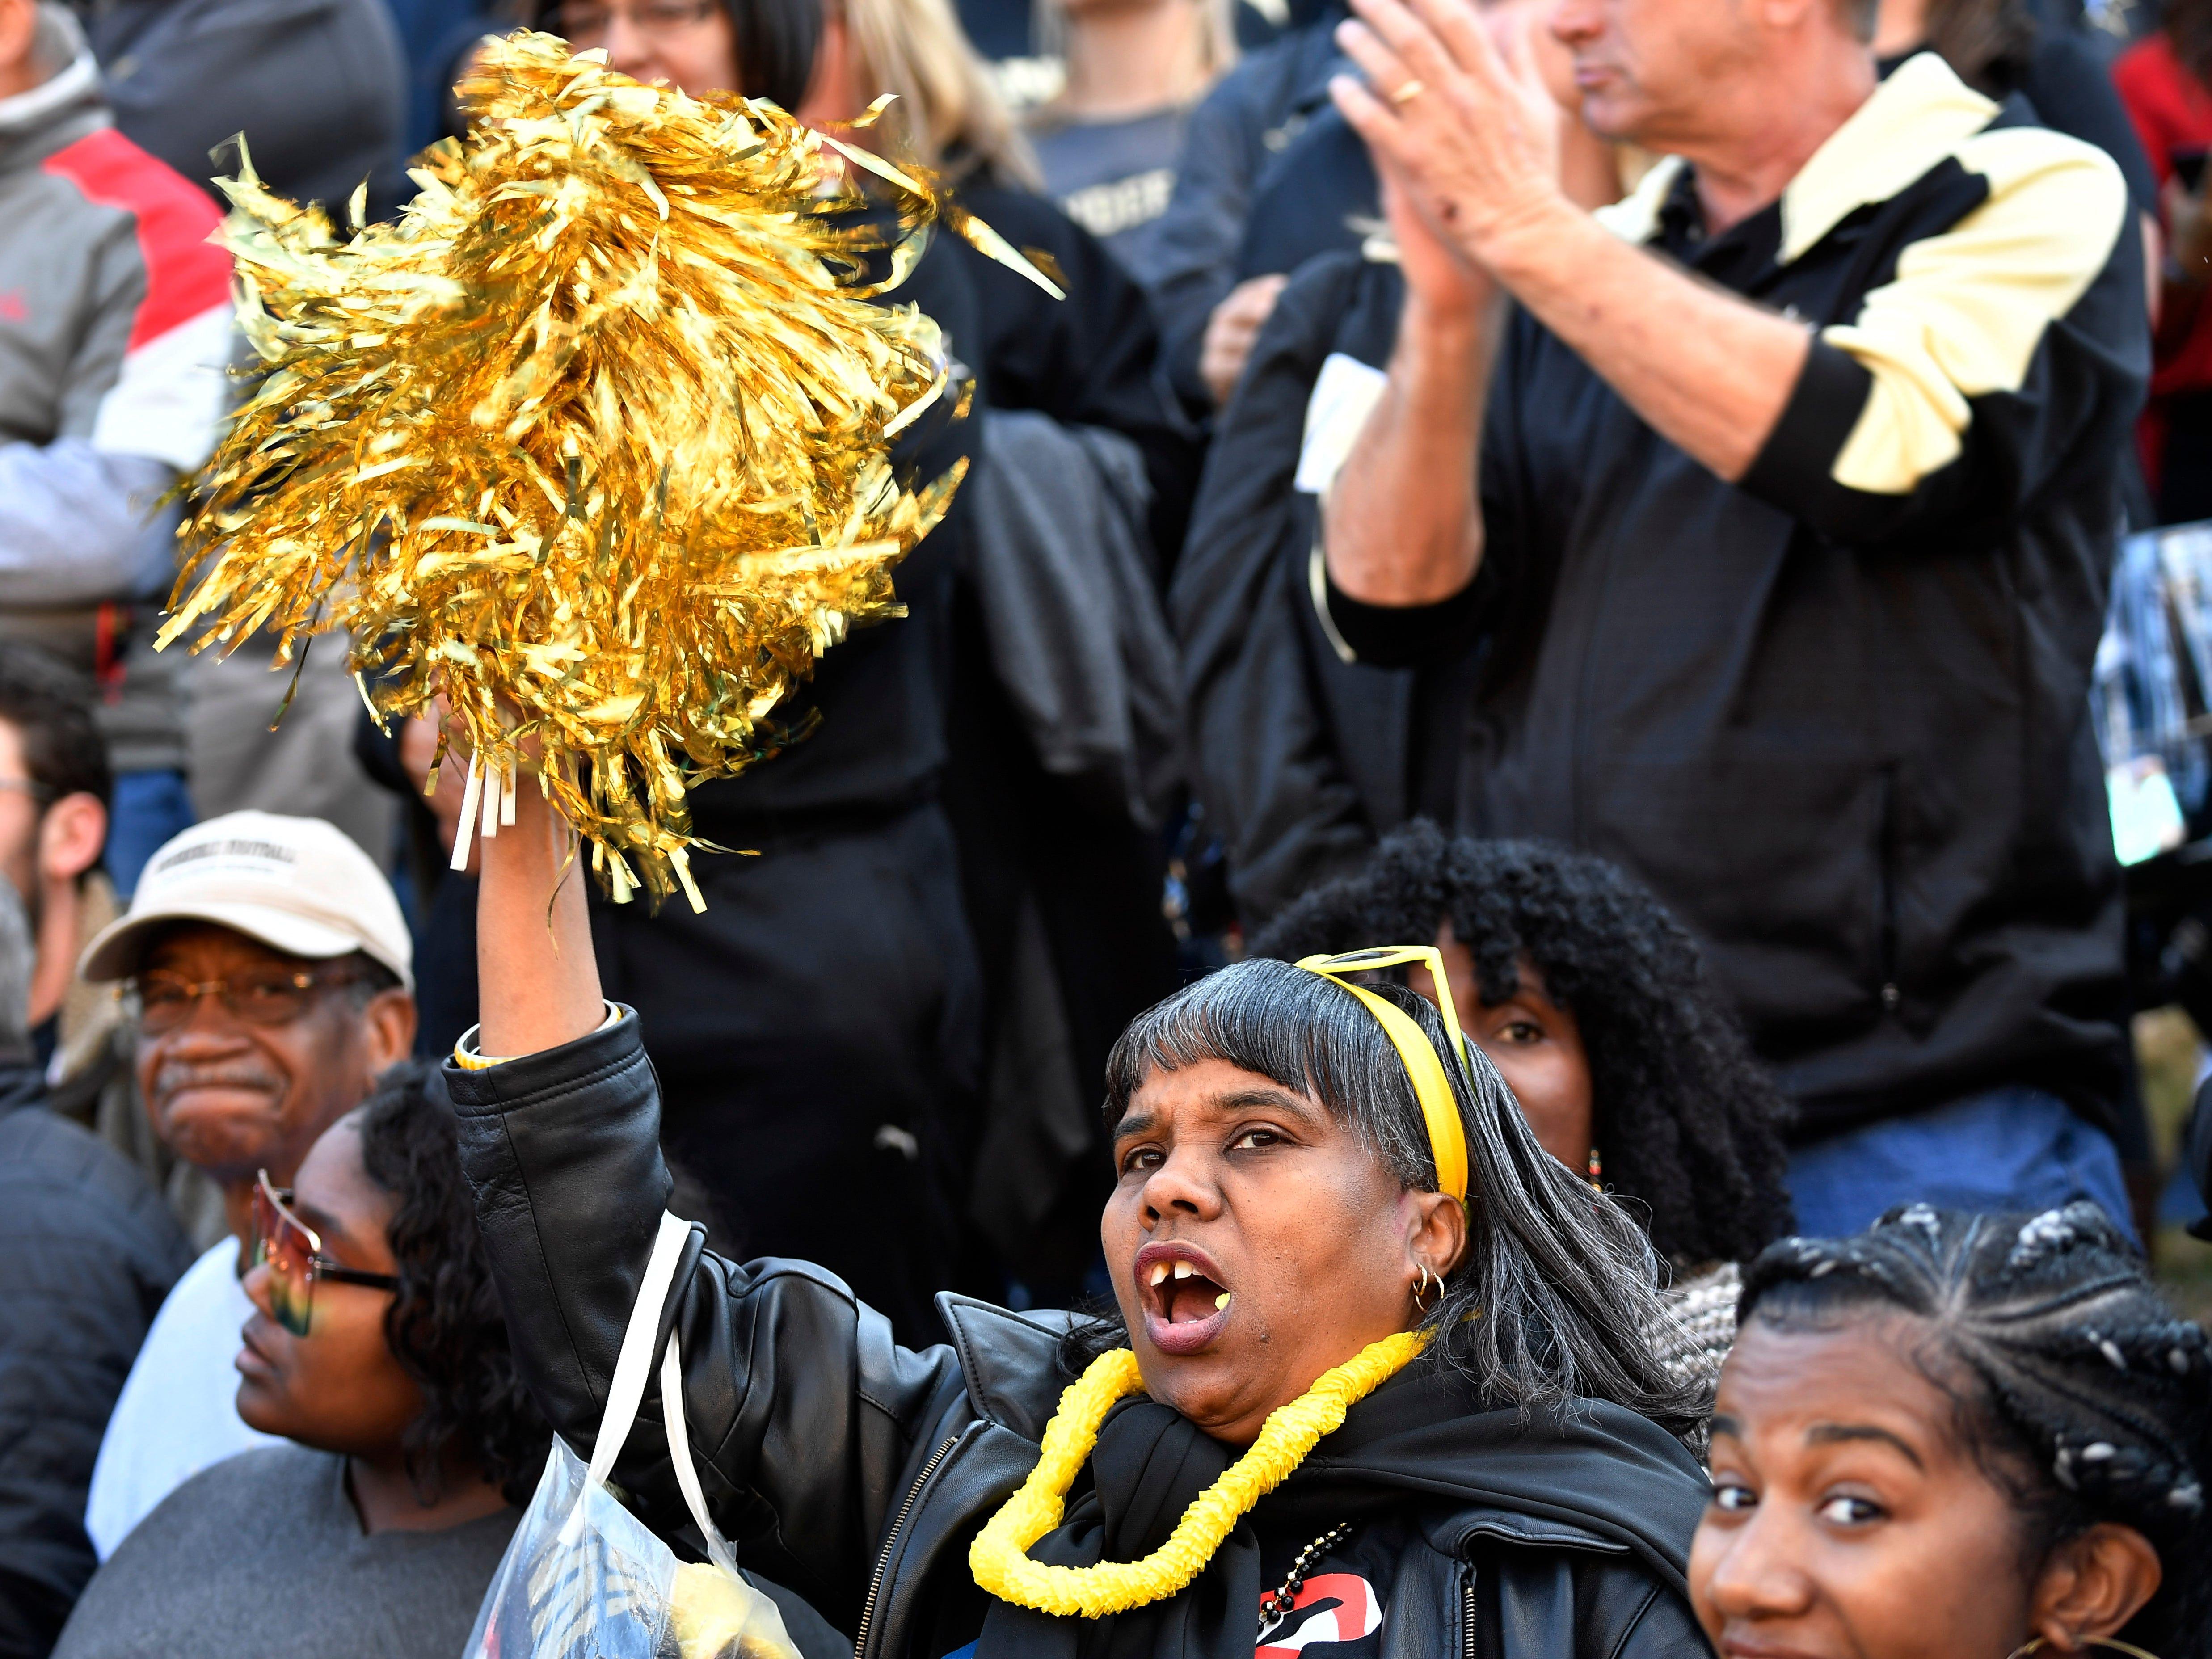 Vandy fans cheer for the team before the game at Vanderbilt Stadium Saturday, Nov. 24, 2018, in Nashville, Tenn.